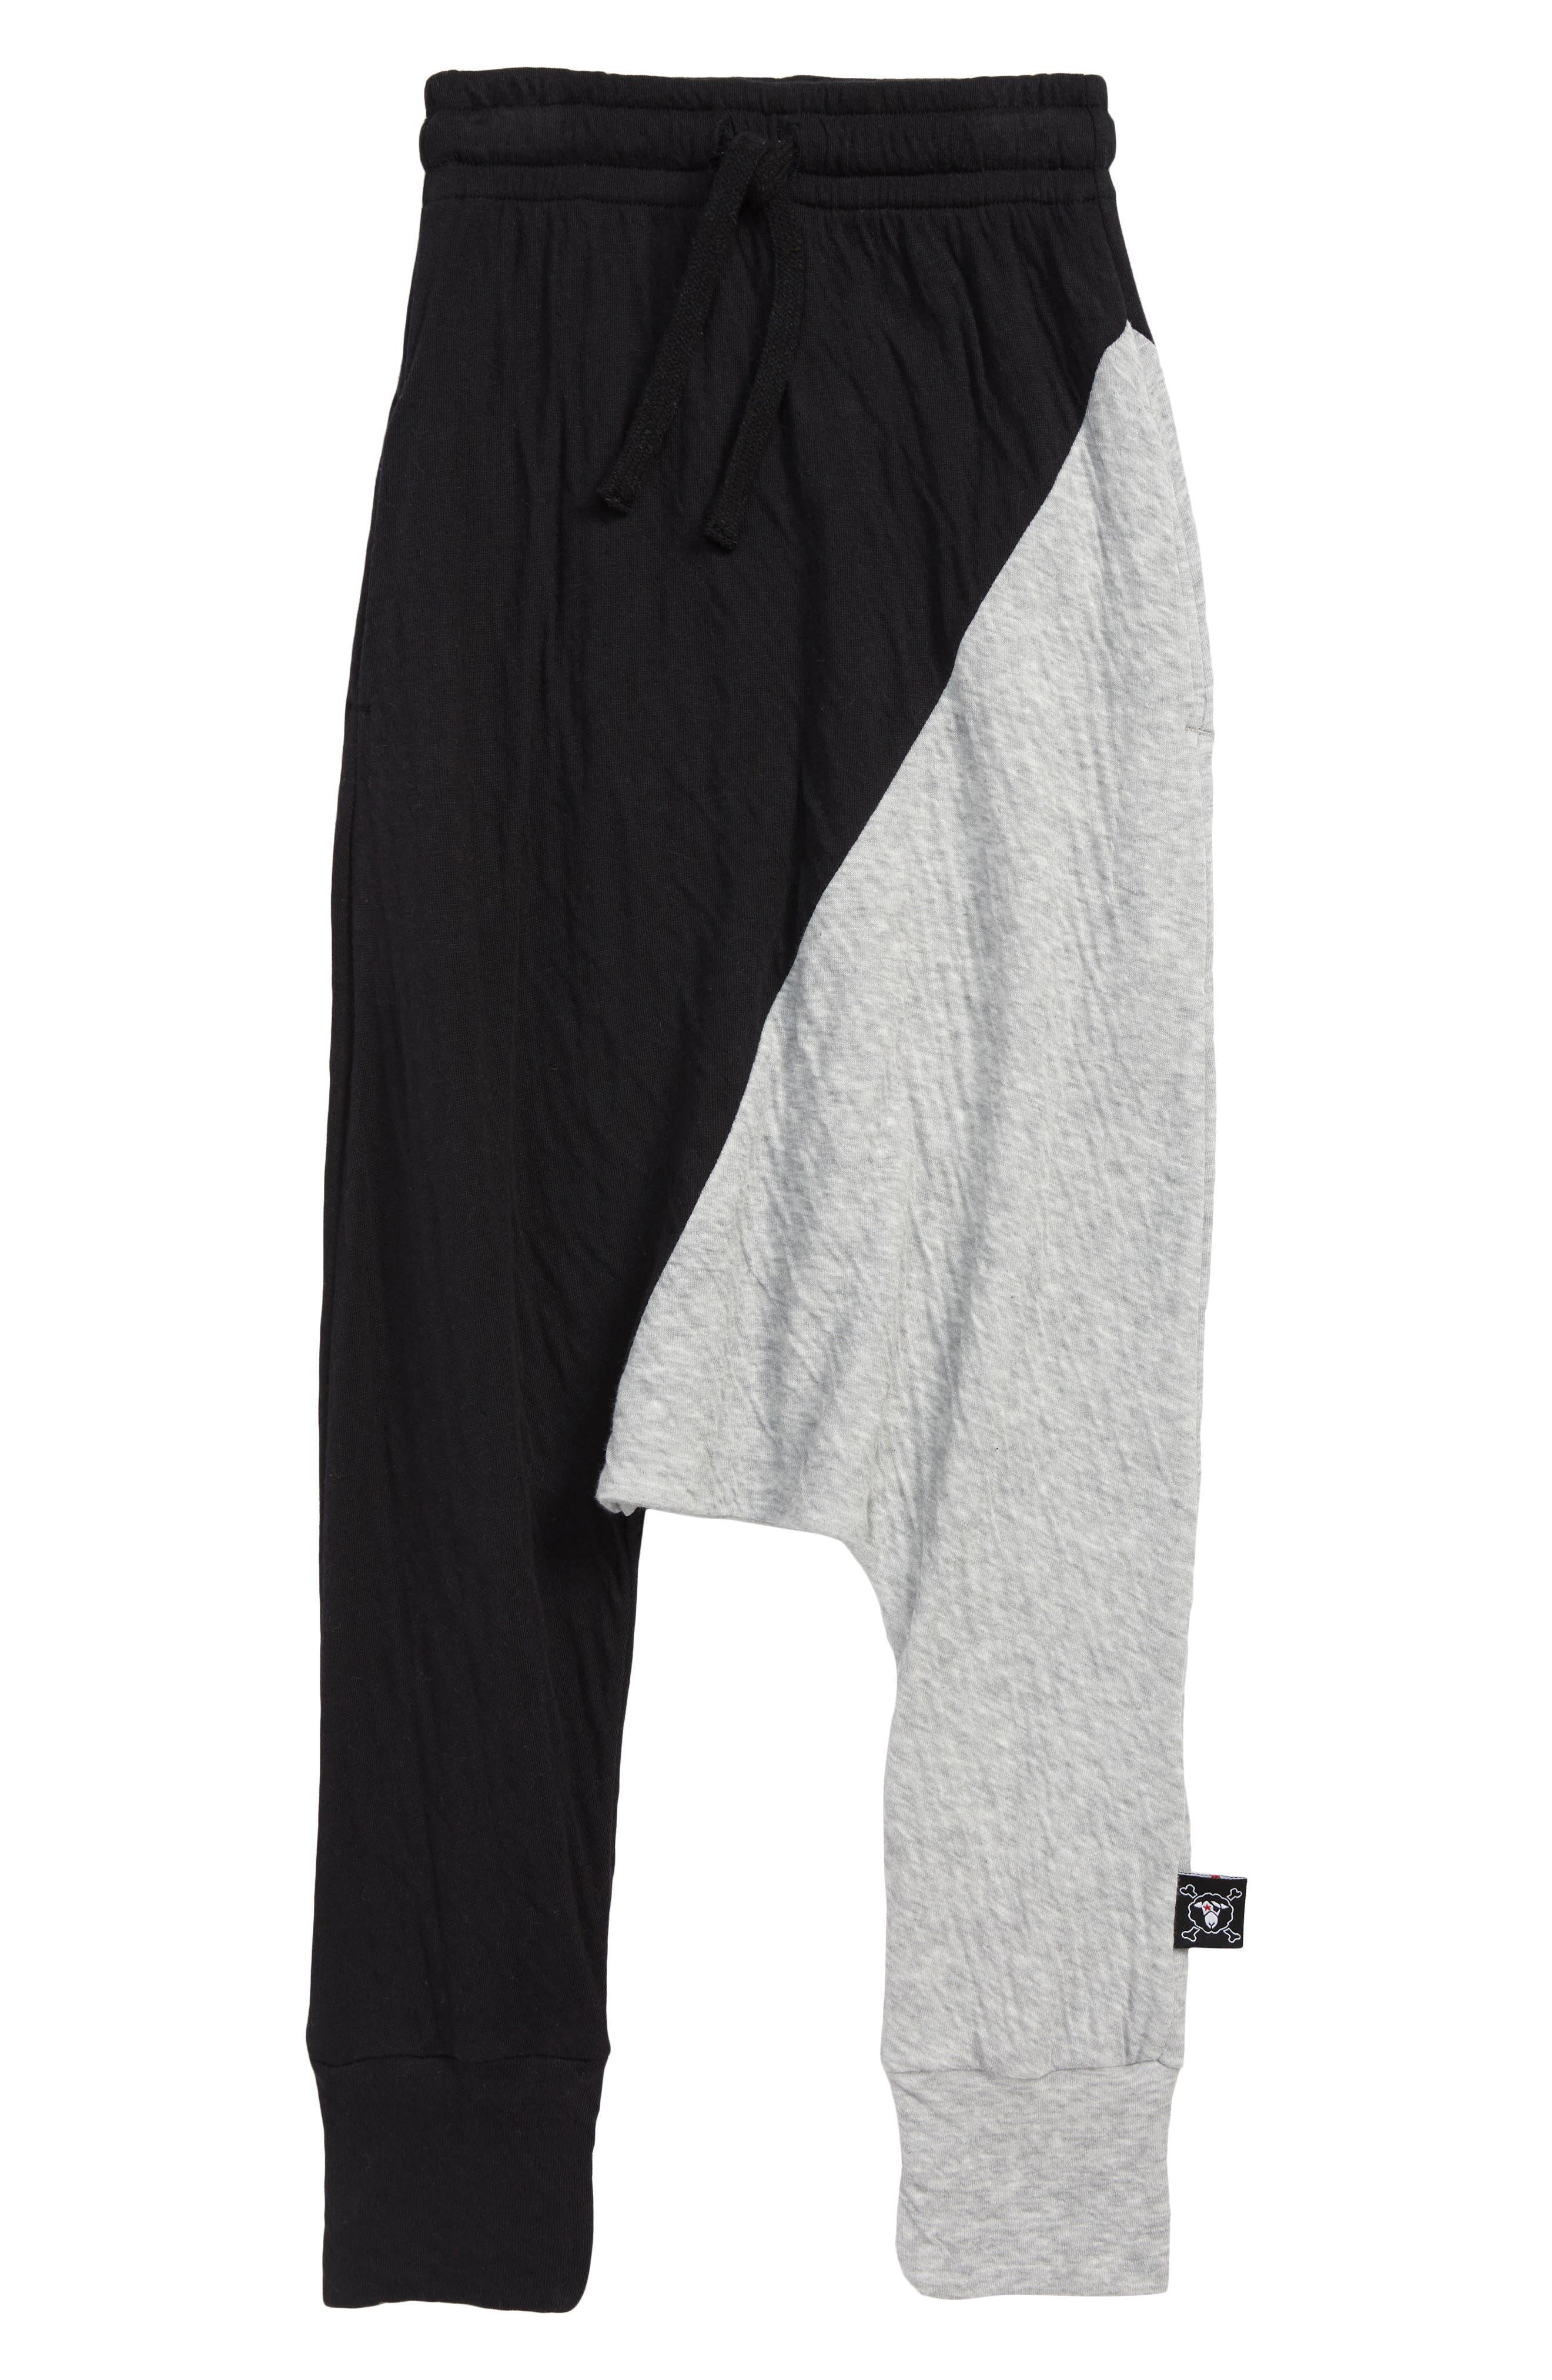 Colorblock Baggy Pants,                             Main thumbnail 1, color,                             BLACK/ HEATHER GREY